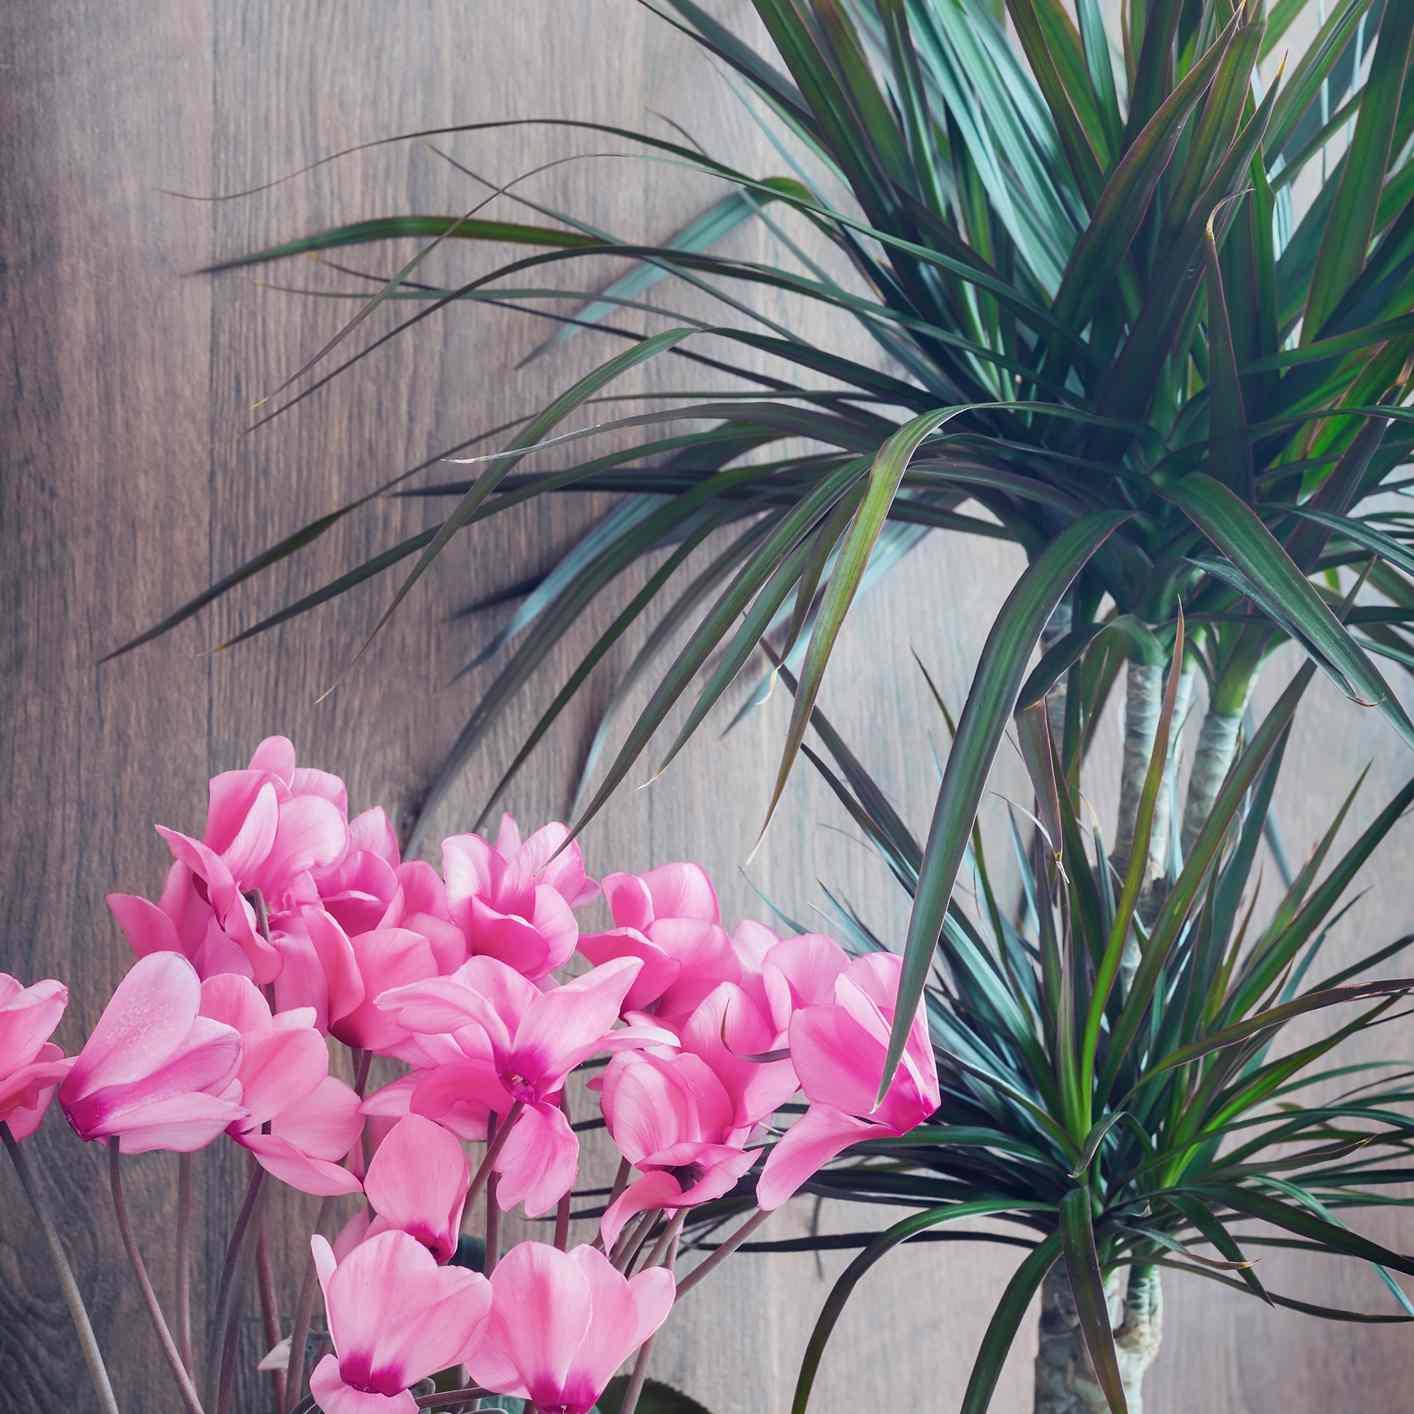 Pink cyclamen and spiky dracaena